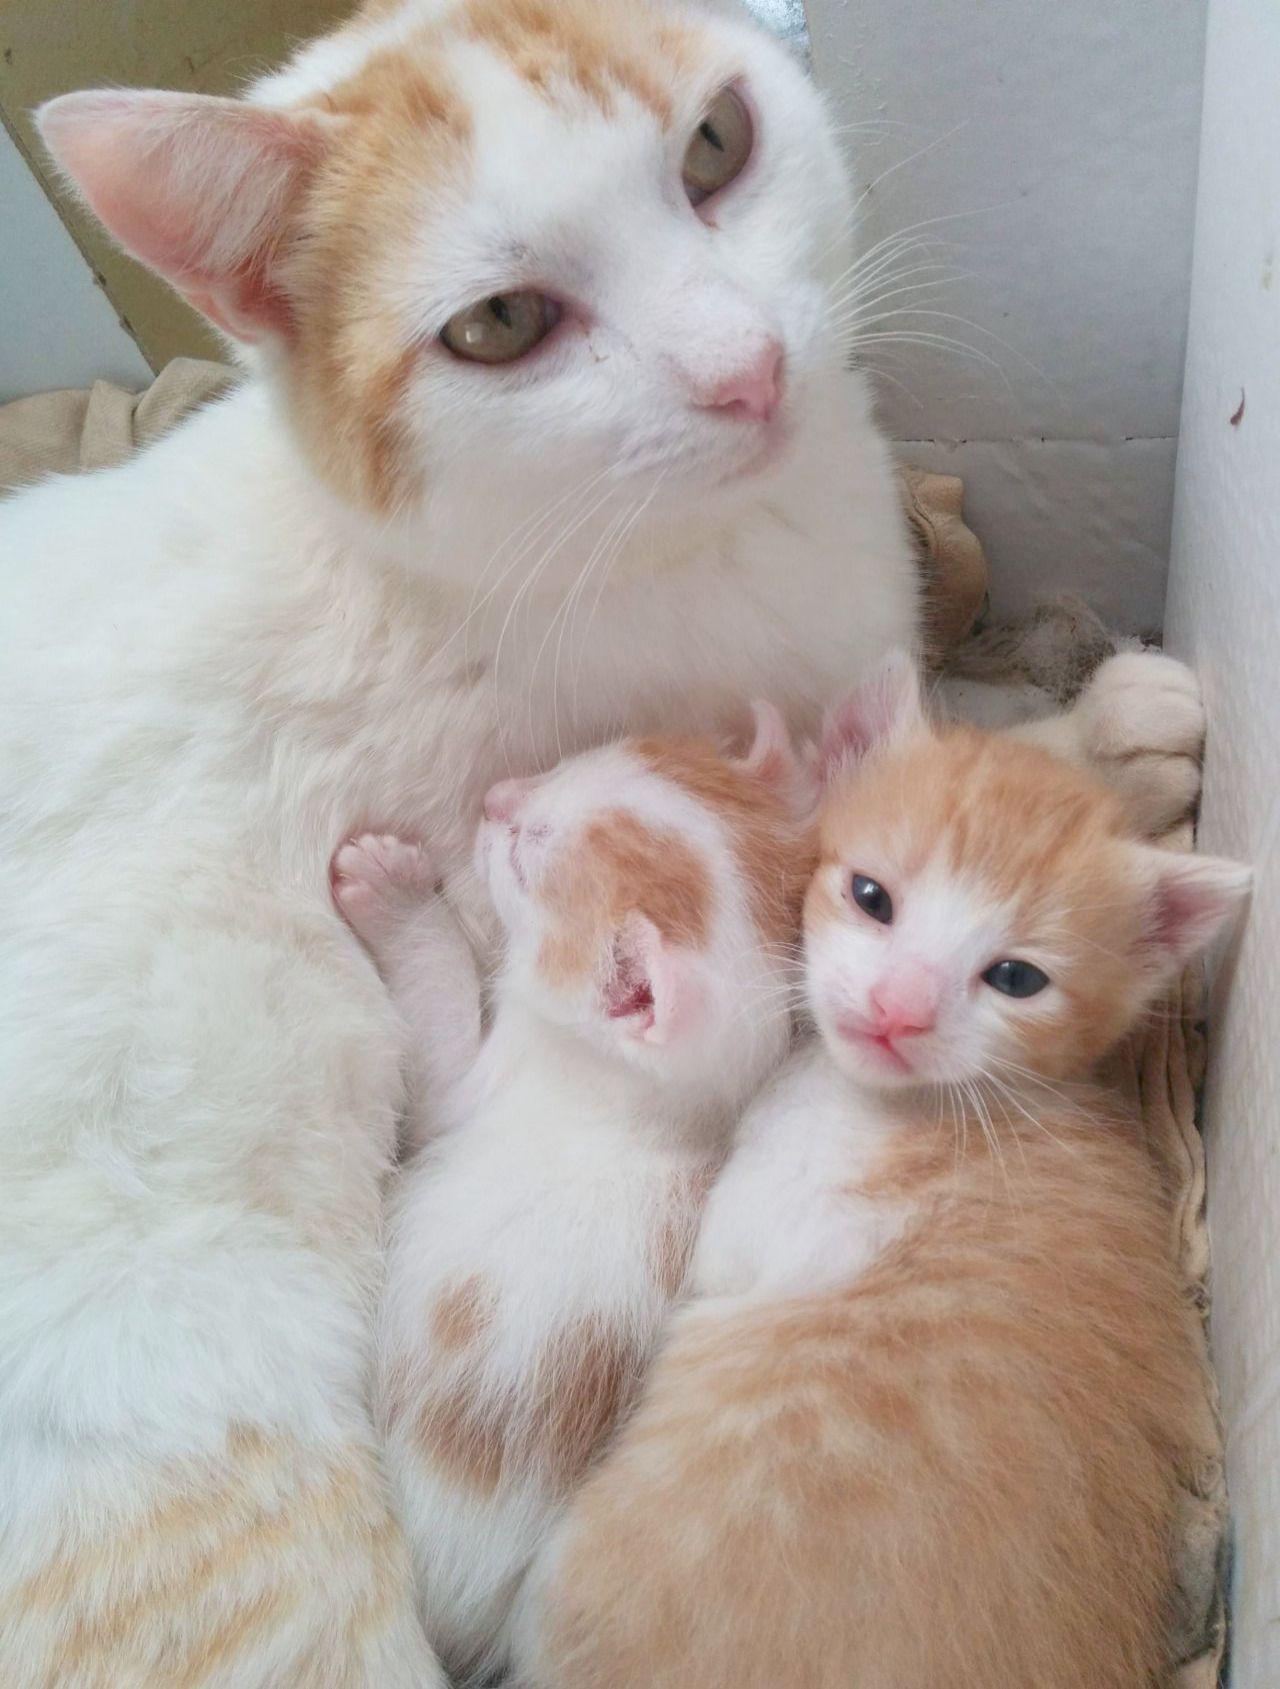 Happy Hanukkah Pretty Cats Cute Cats And Kittens Kittens